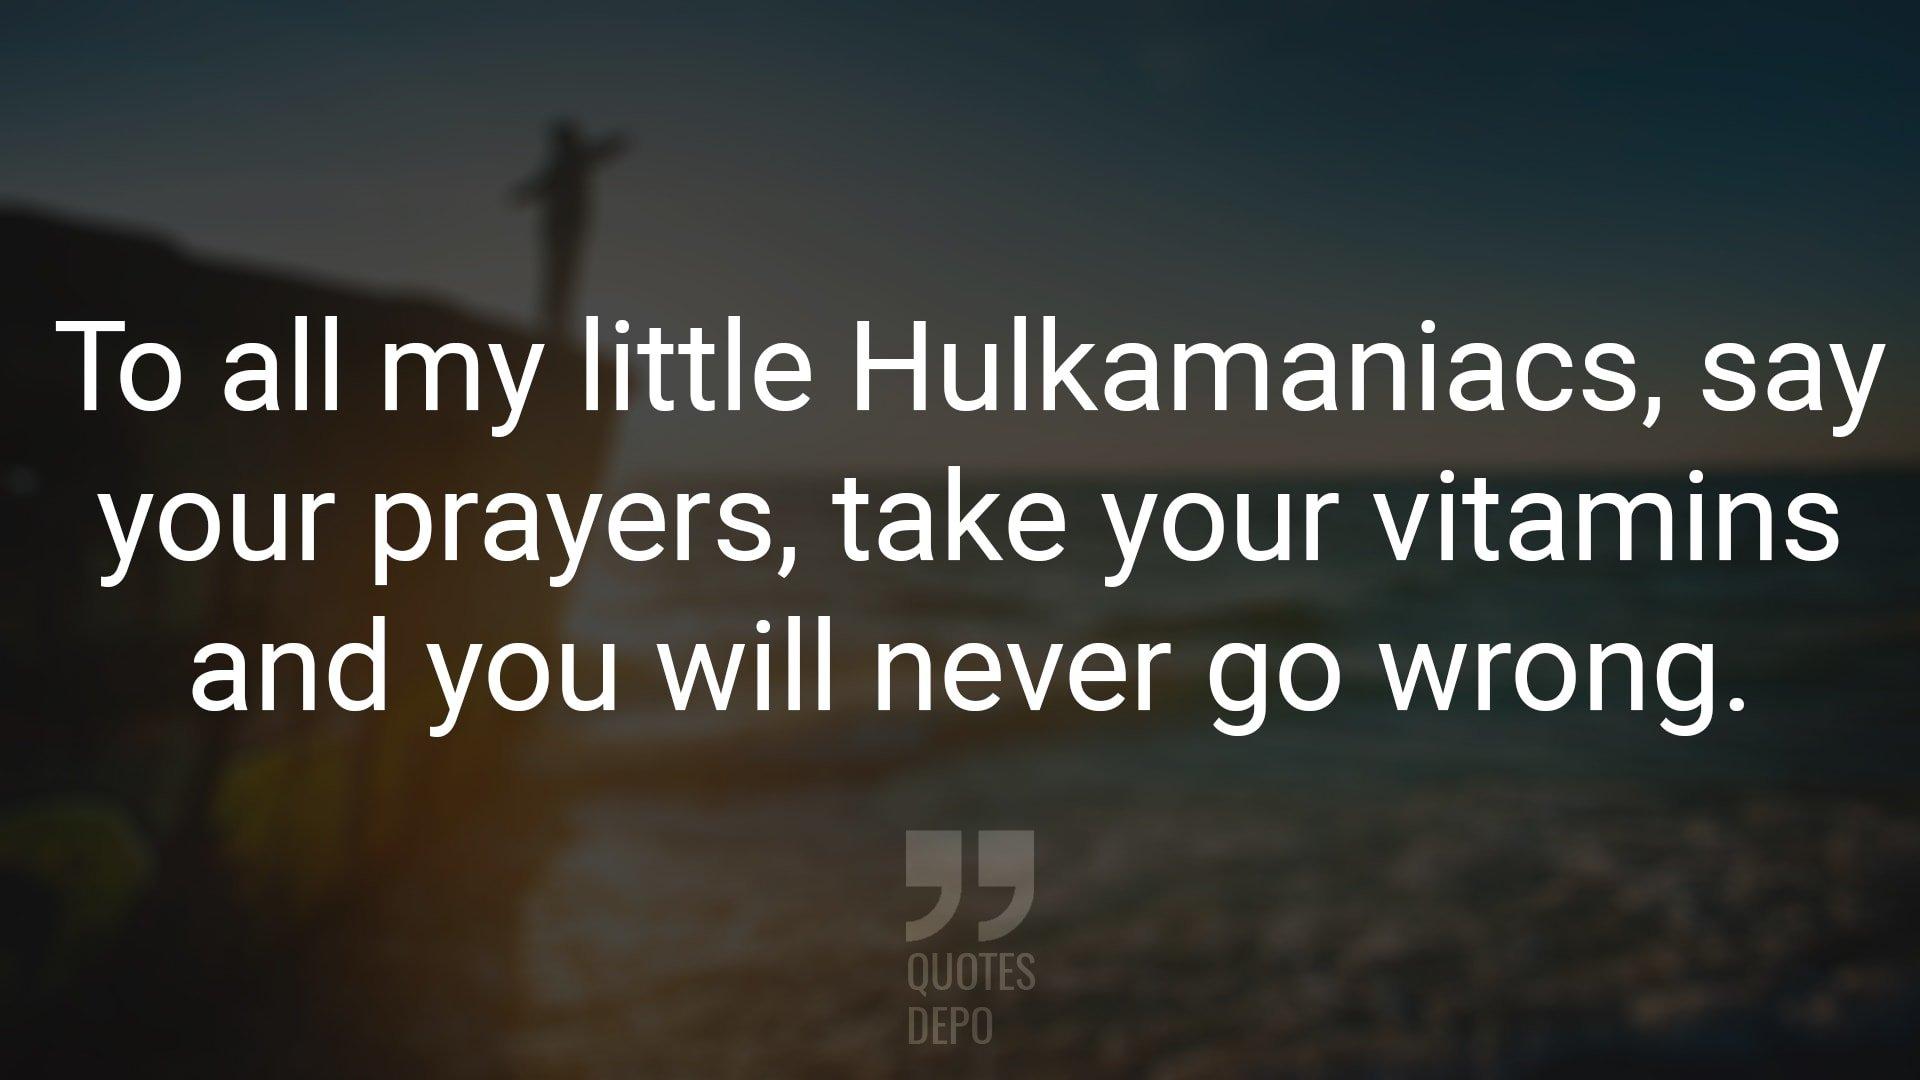 To All My Little Hulkamaniacs